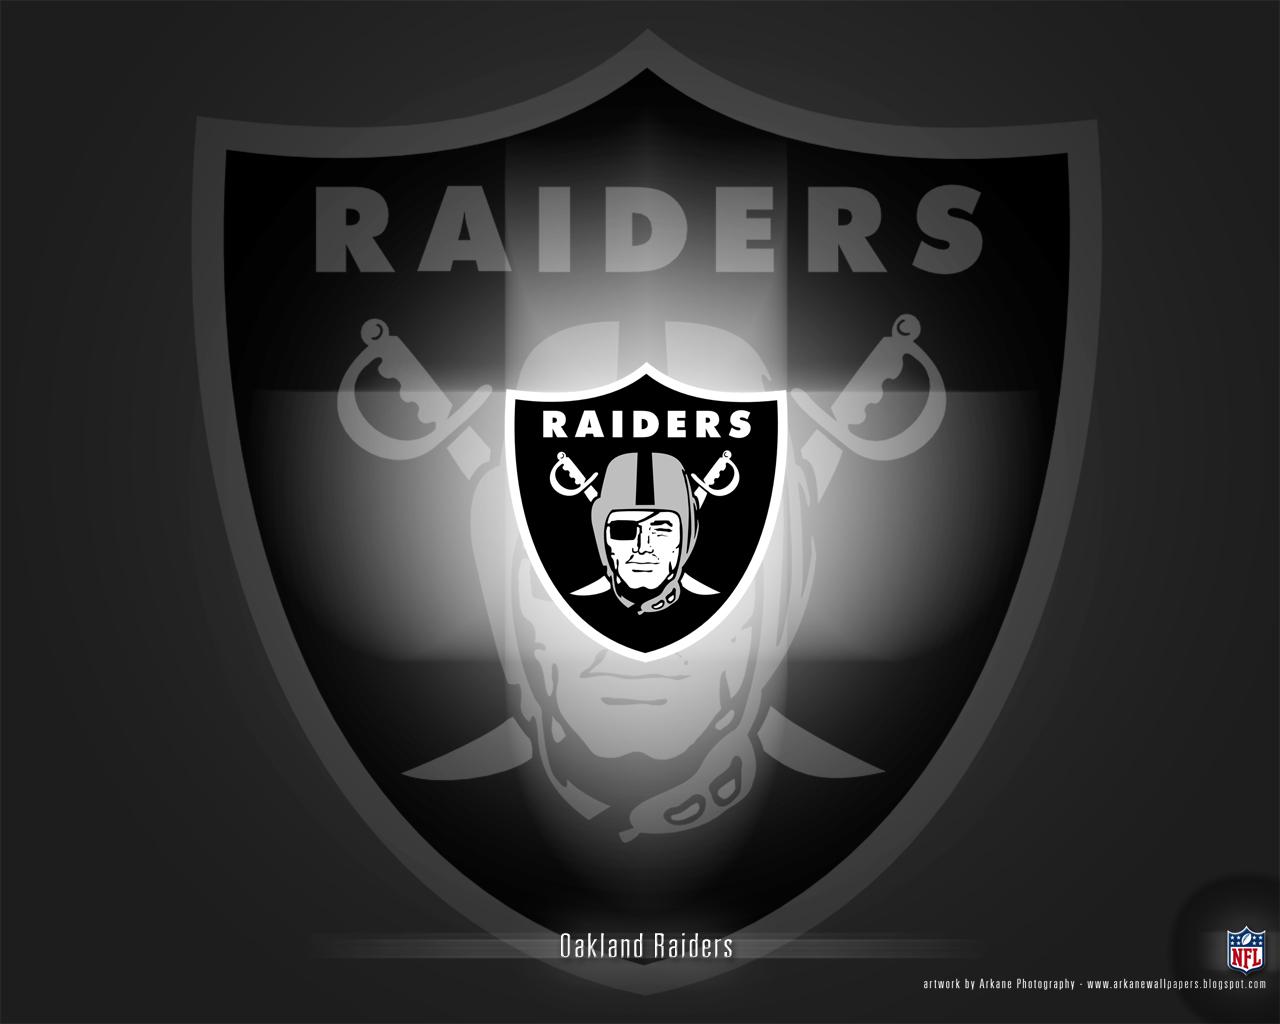 Arkane NFL Wallpapers Oakland Raiders   Vol 1 1280x1024